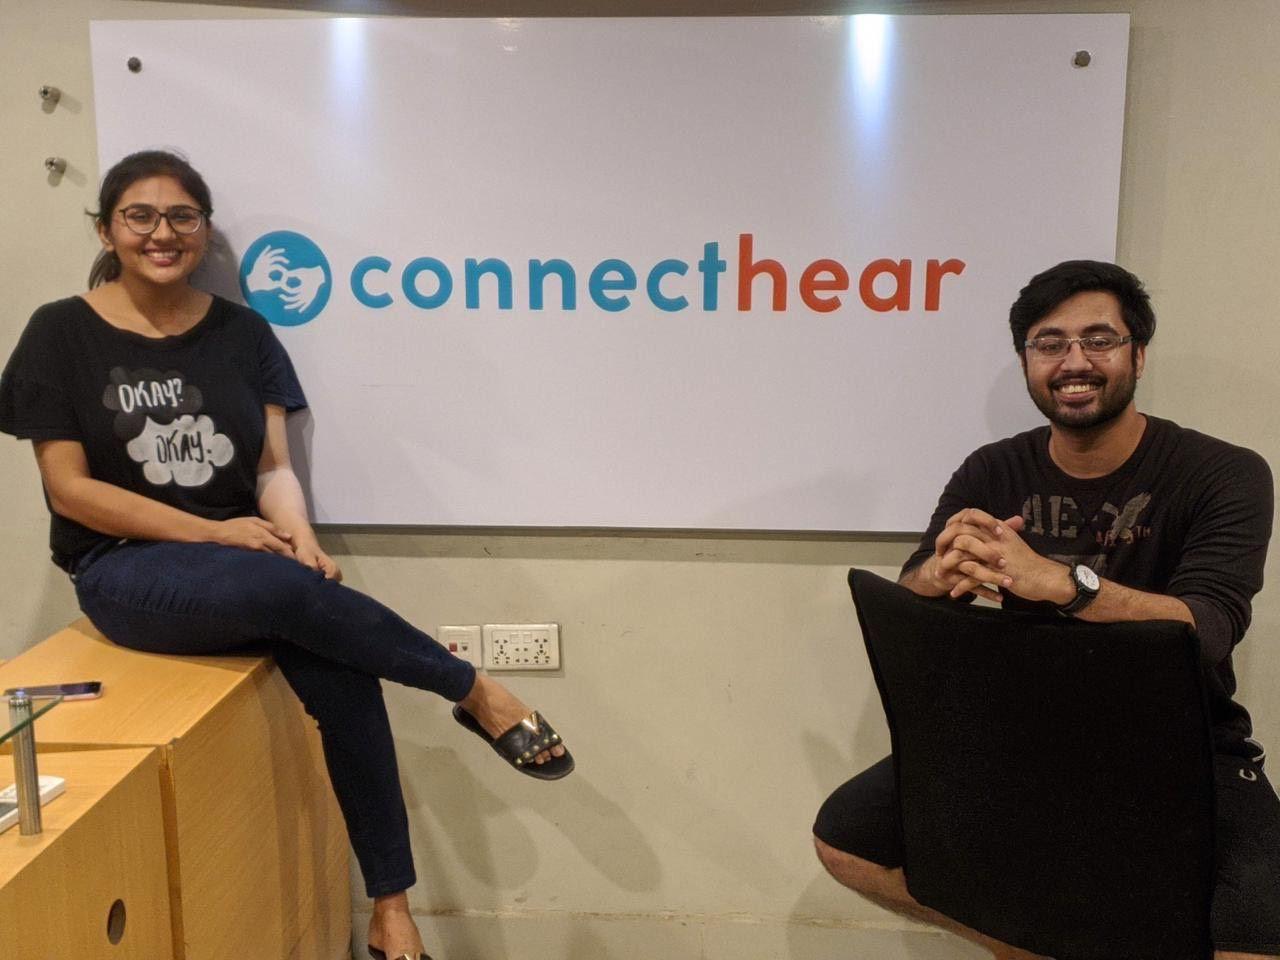 connecthear